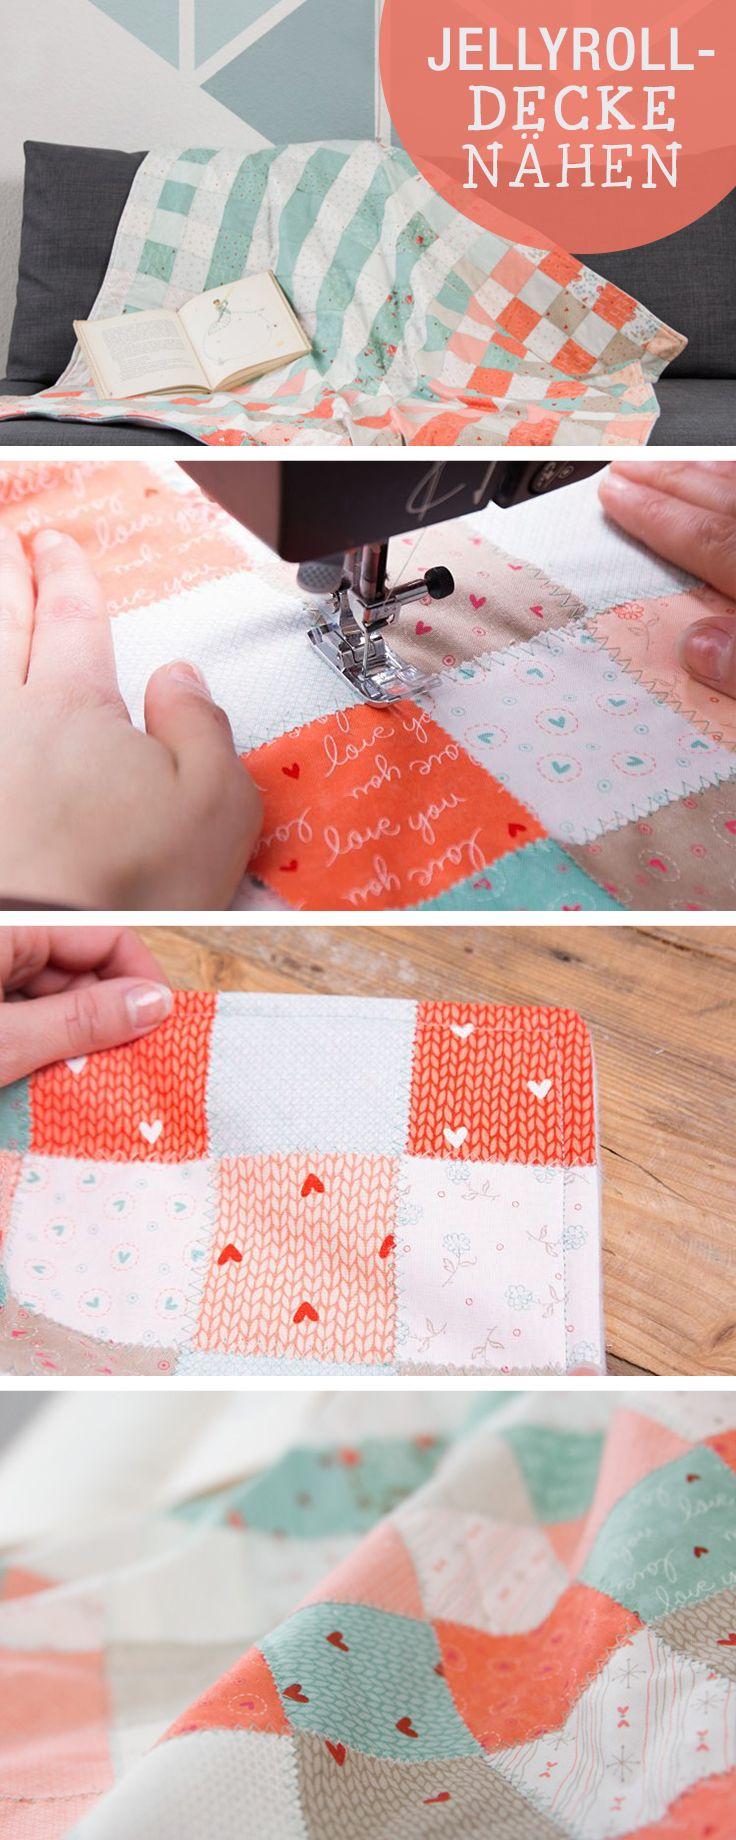 diy anleitung n he deine erste patchworkdecke diy tutorial how to sew a patchwork blanket. Black Bedroom Furniture Sets. Home Design Ideas